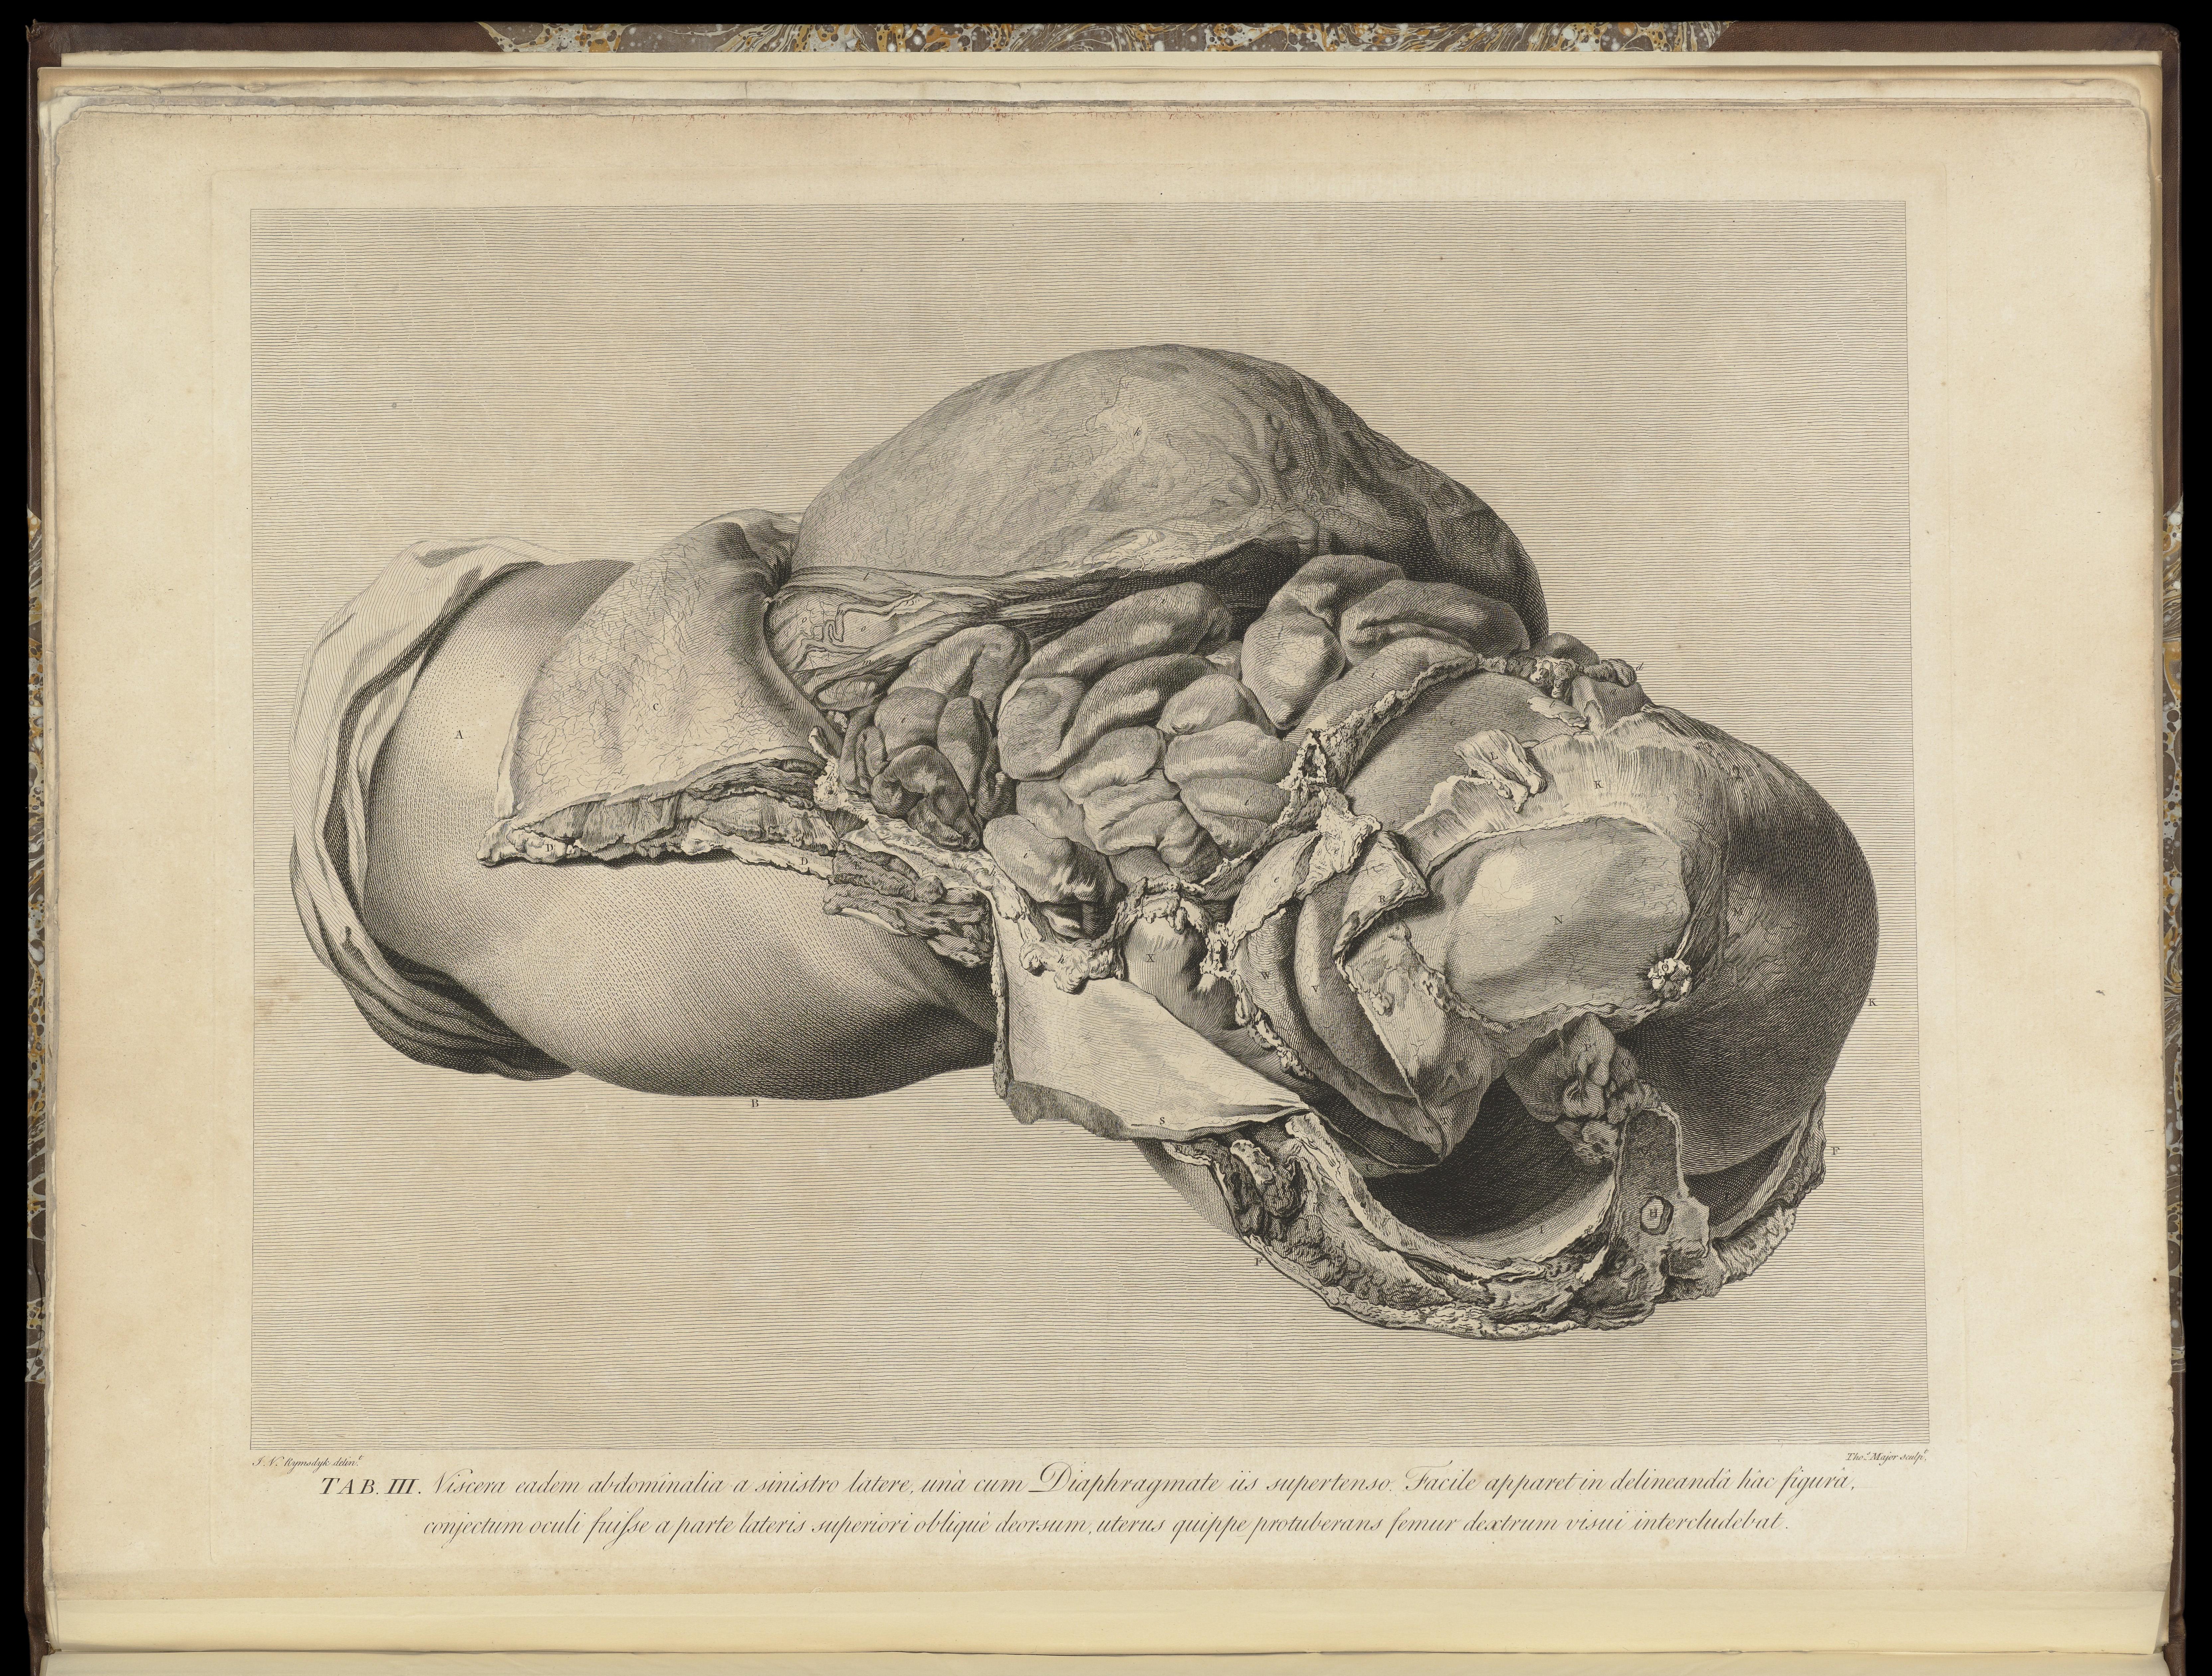 Filethe Anatomy Of The Human Gravid Uterus Exhibited In Figures